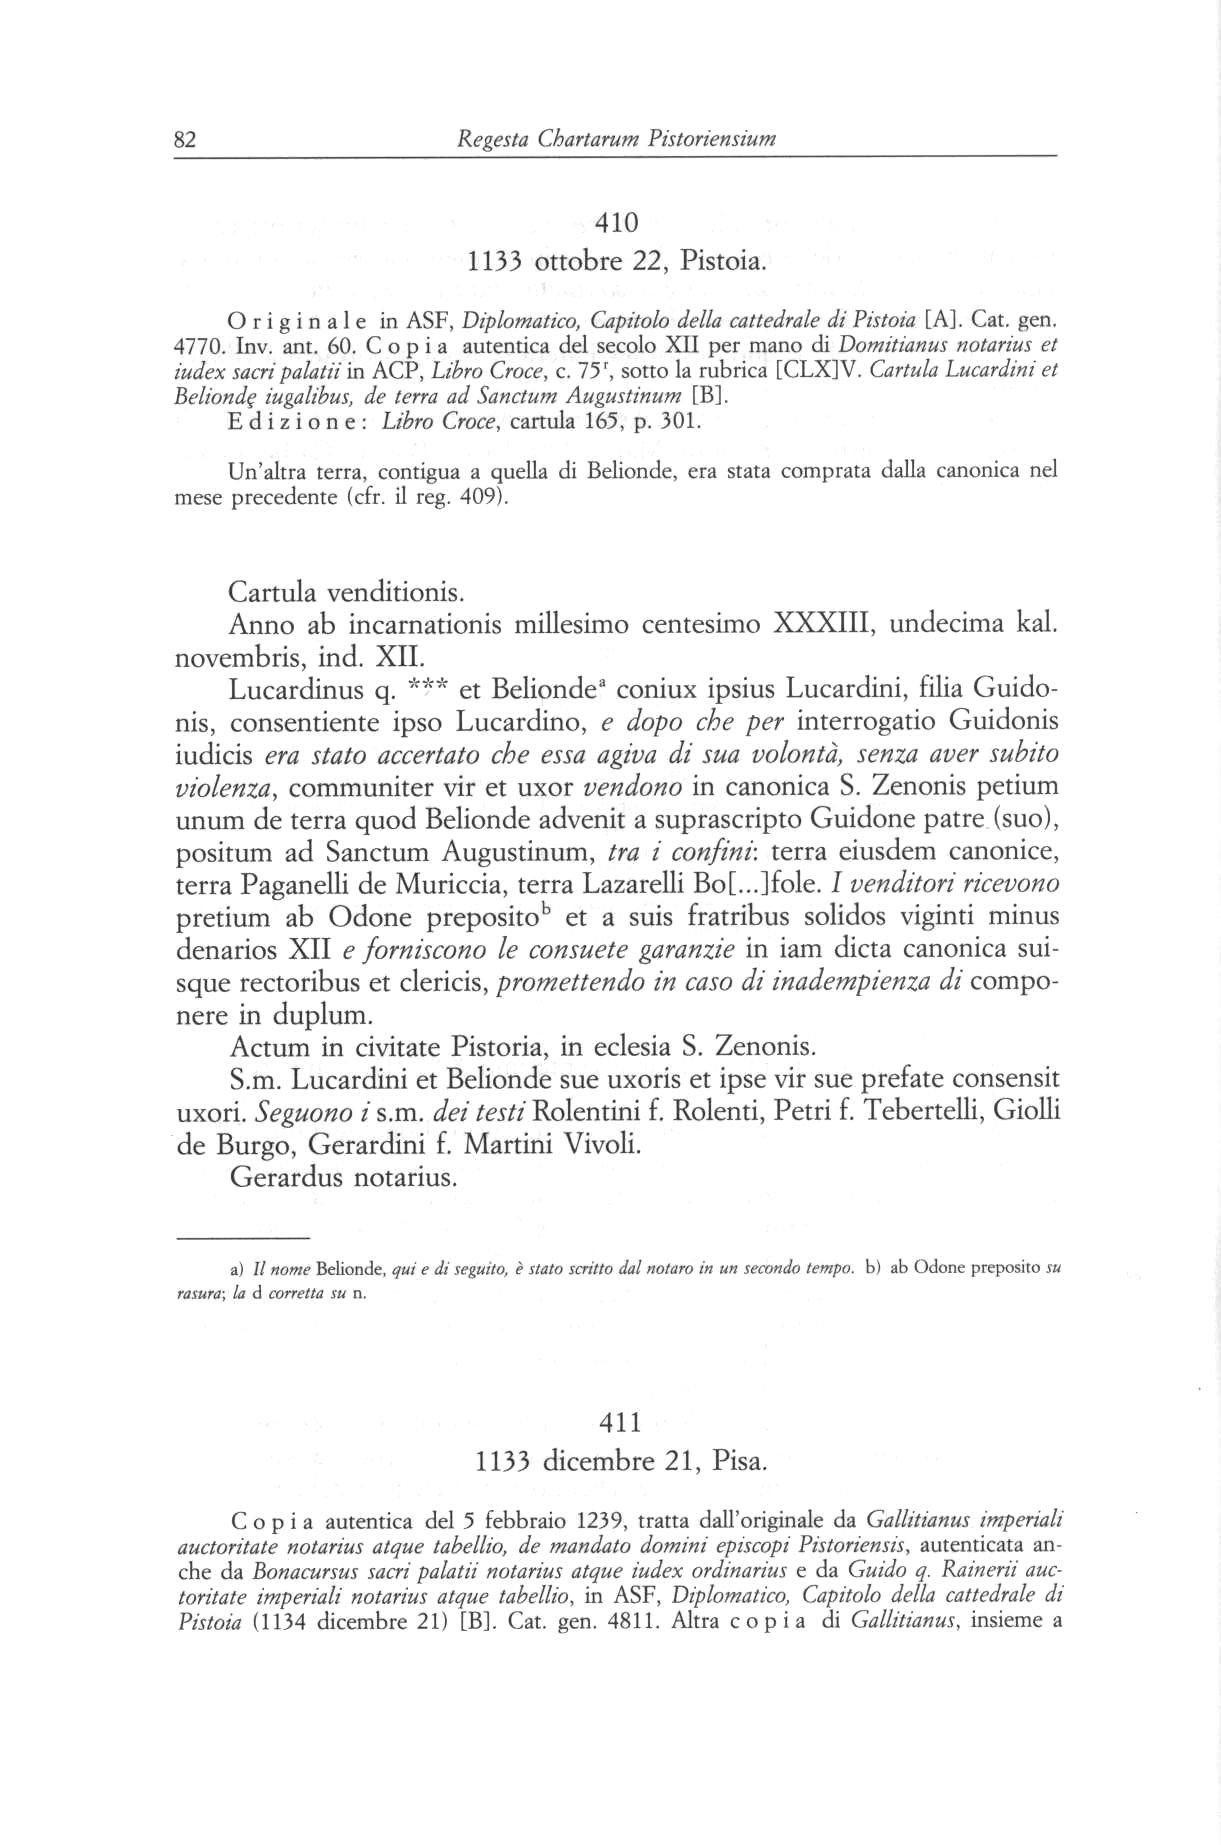 Canonica S. Zenone XII 0082.jpg